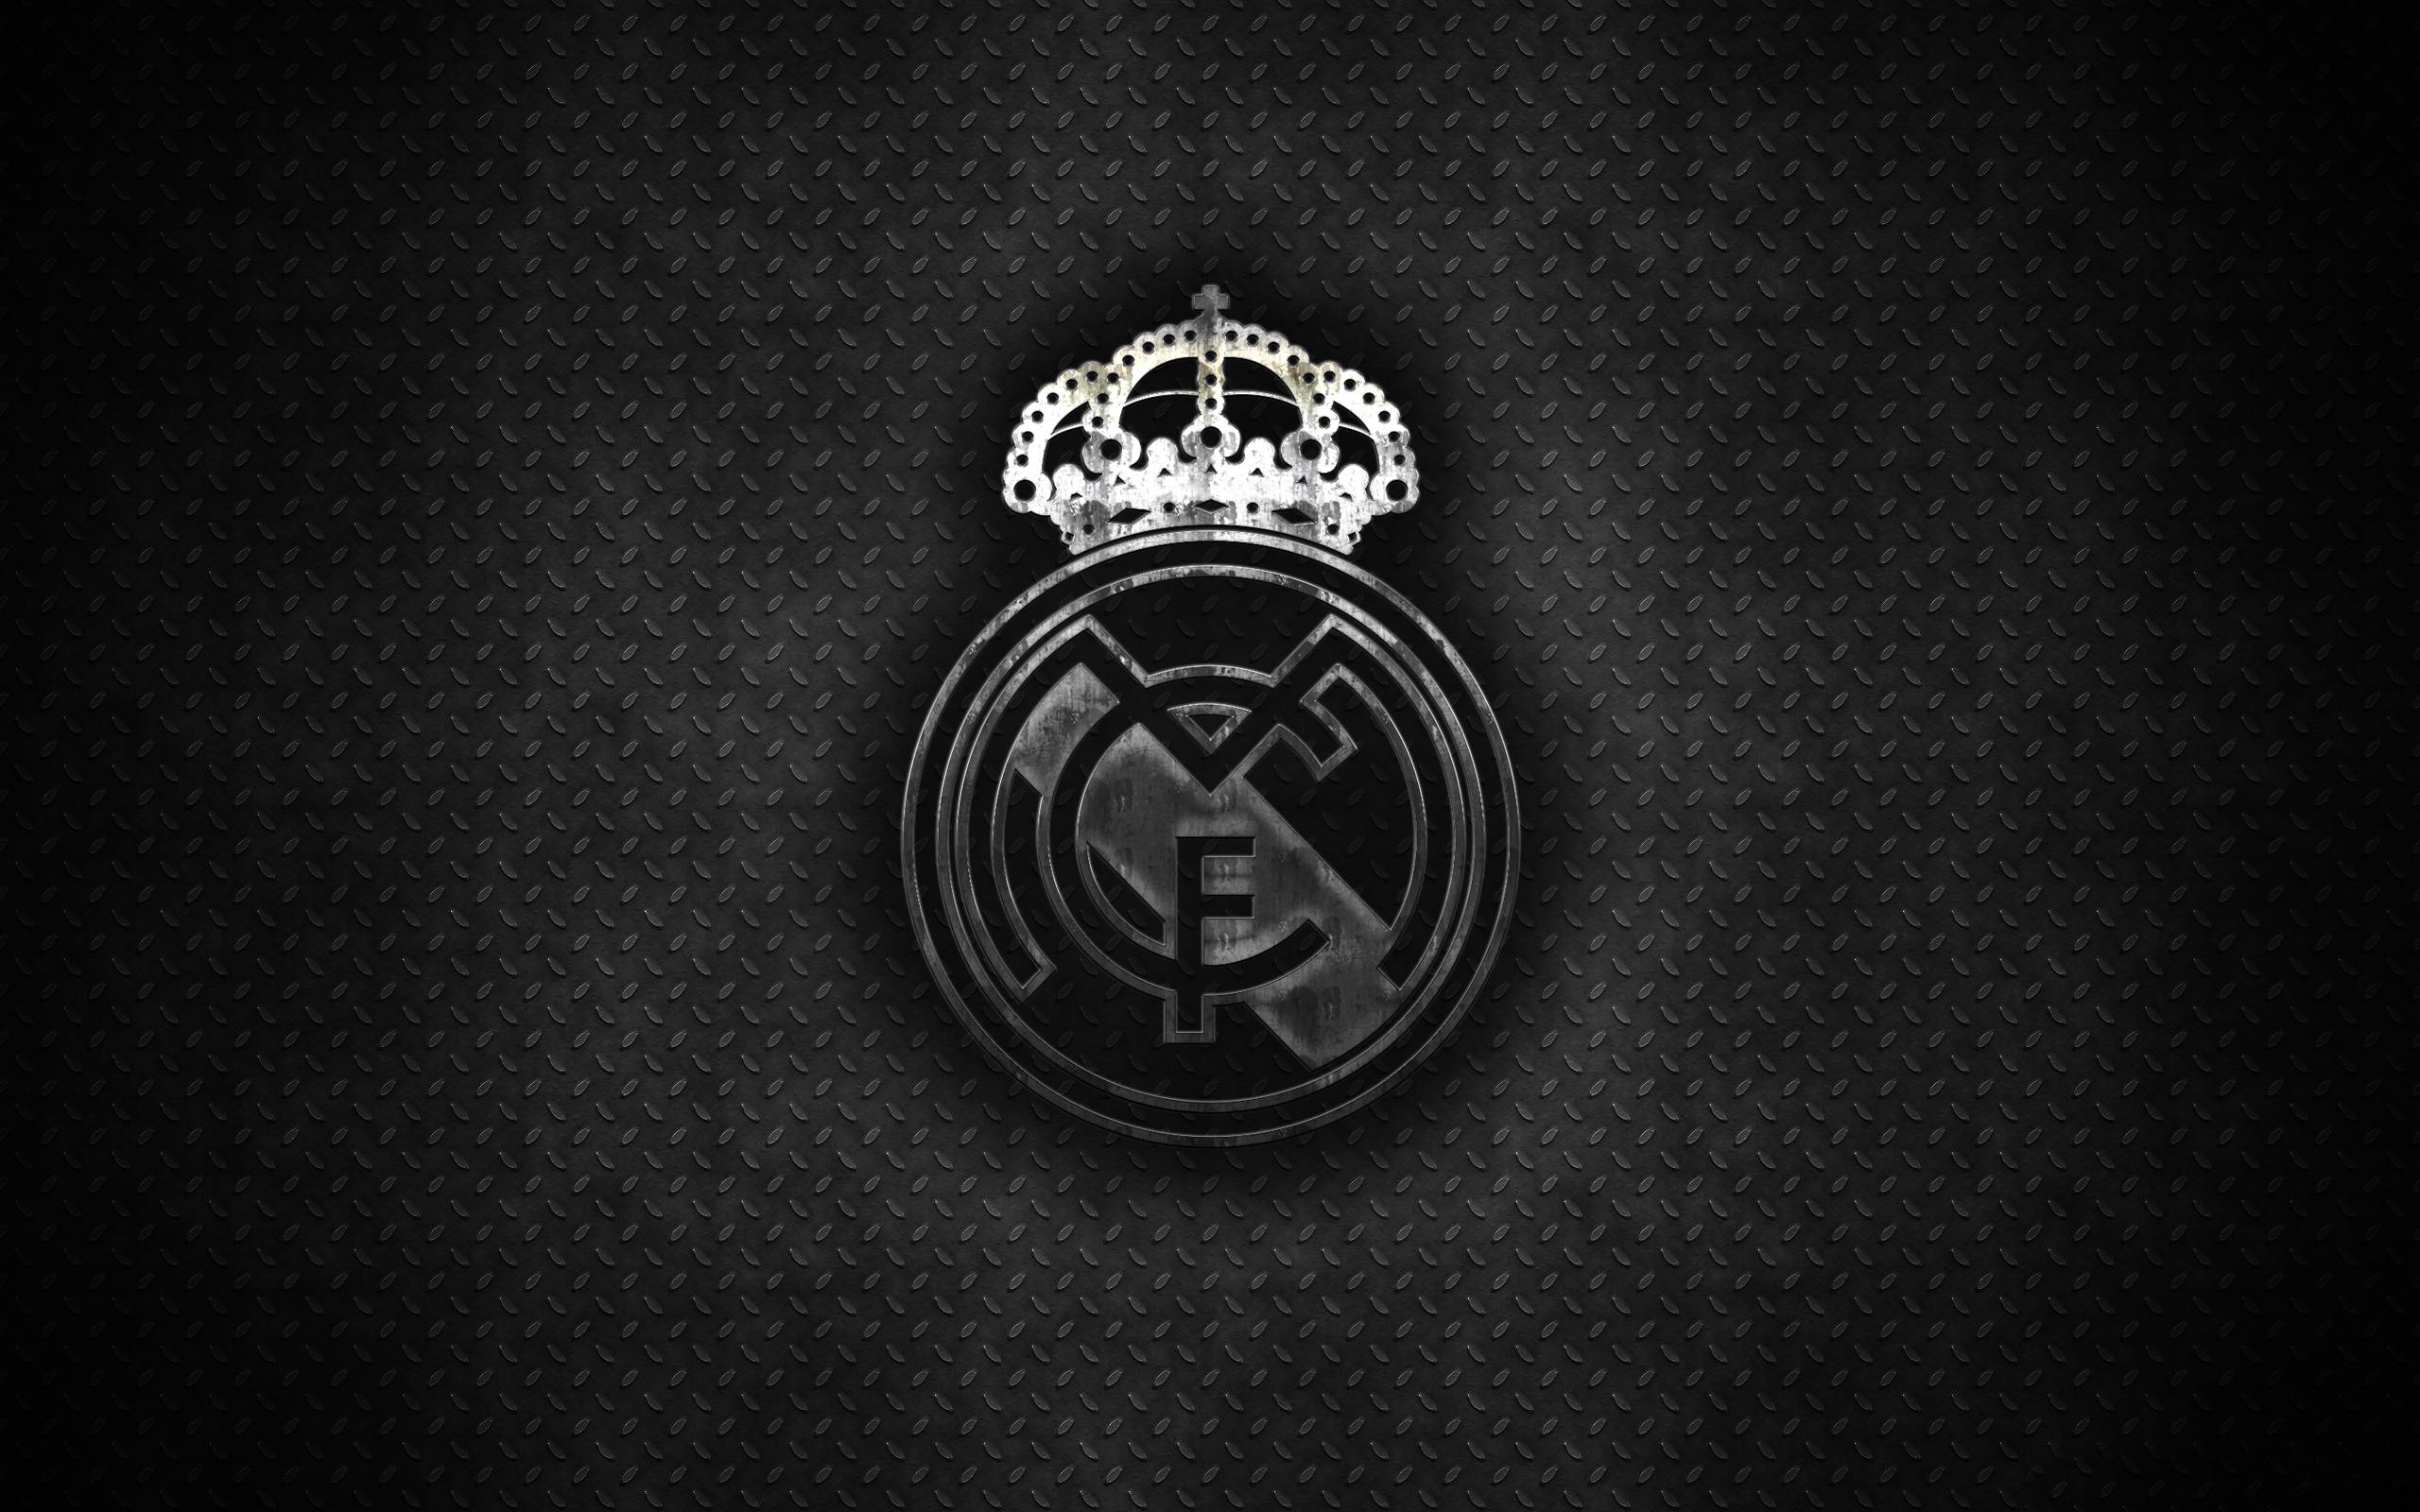 Real Madrid Logo Hd Wallpaper Background Image 2560x1600